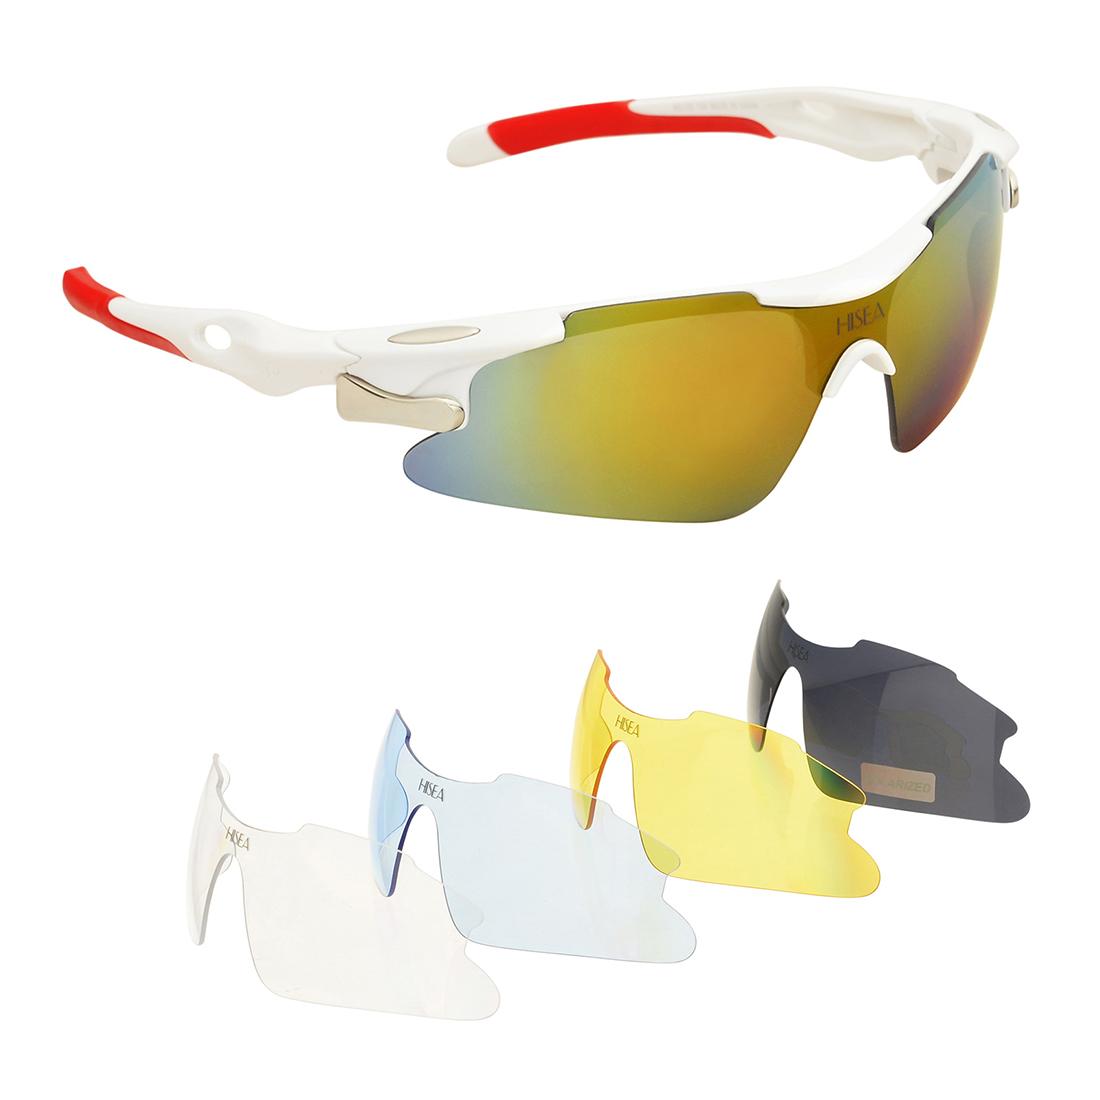 HISEA Polarized Sports Sunglasses for Men Women Cycling Running Driving Glasses